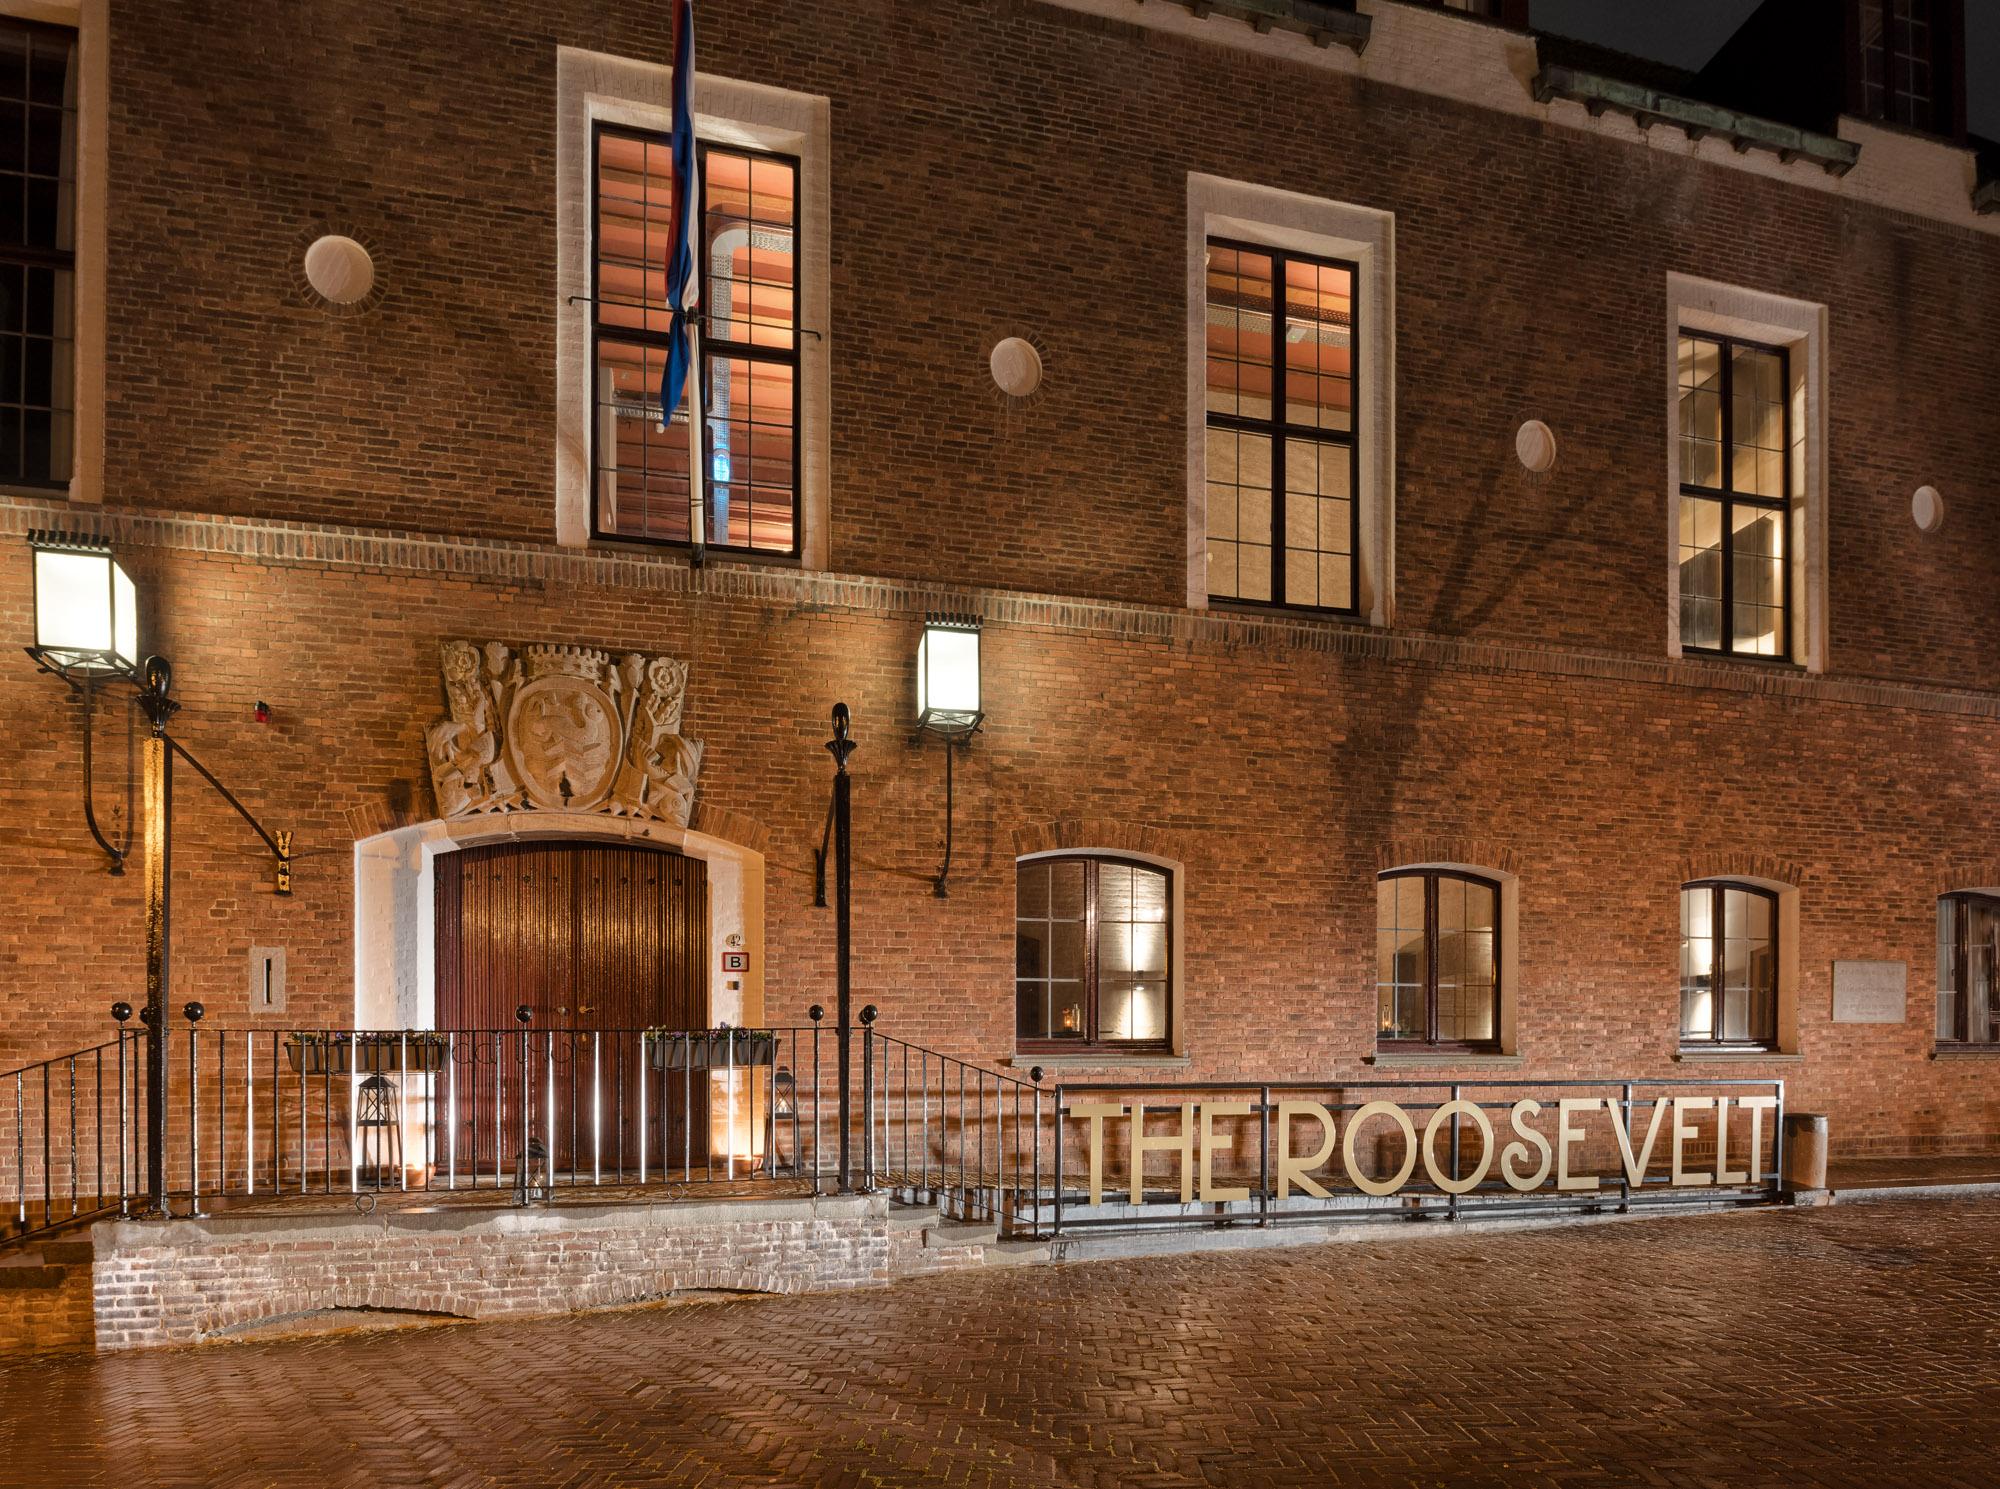 estida-hotel-the-roosevelt-middelburg-gevel